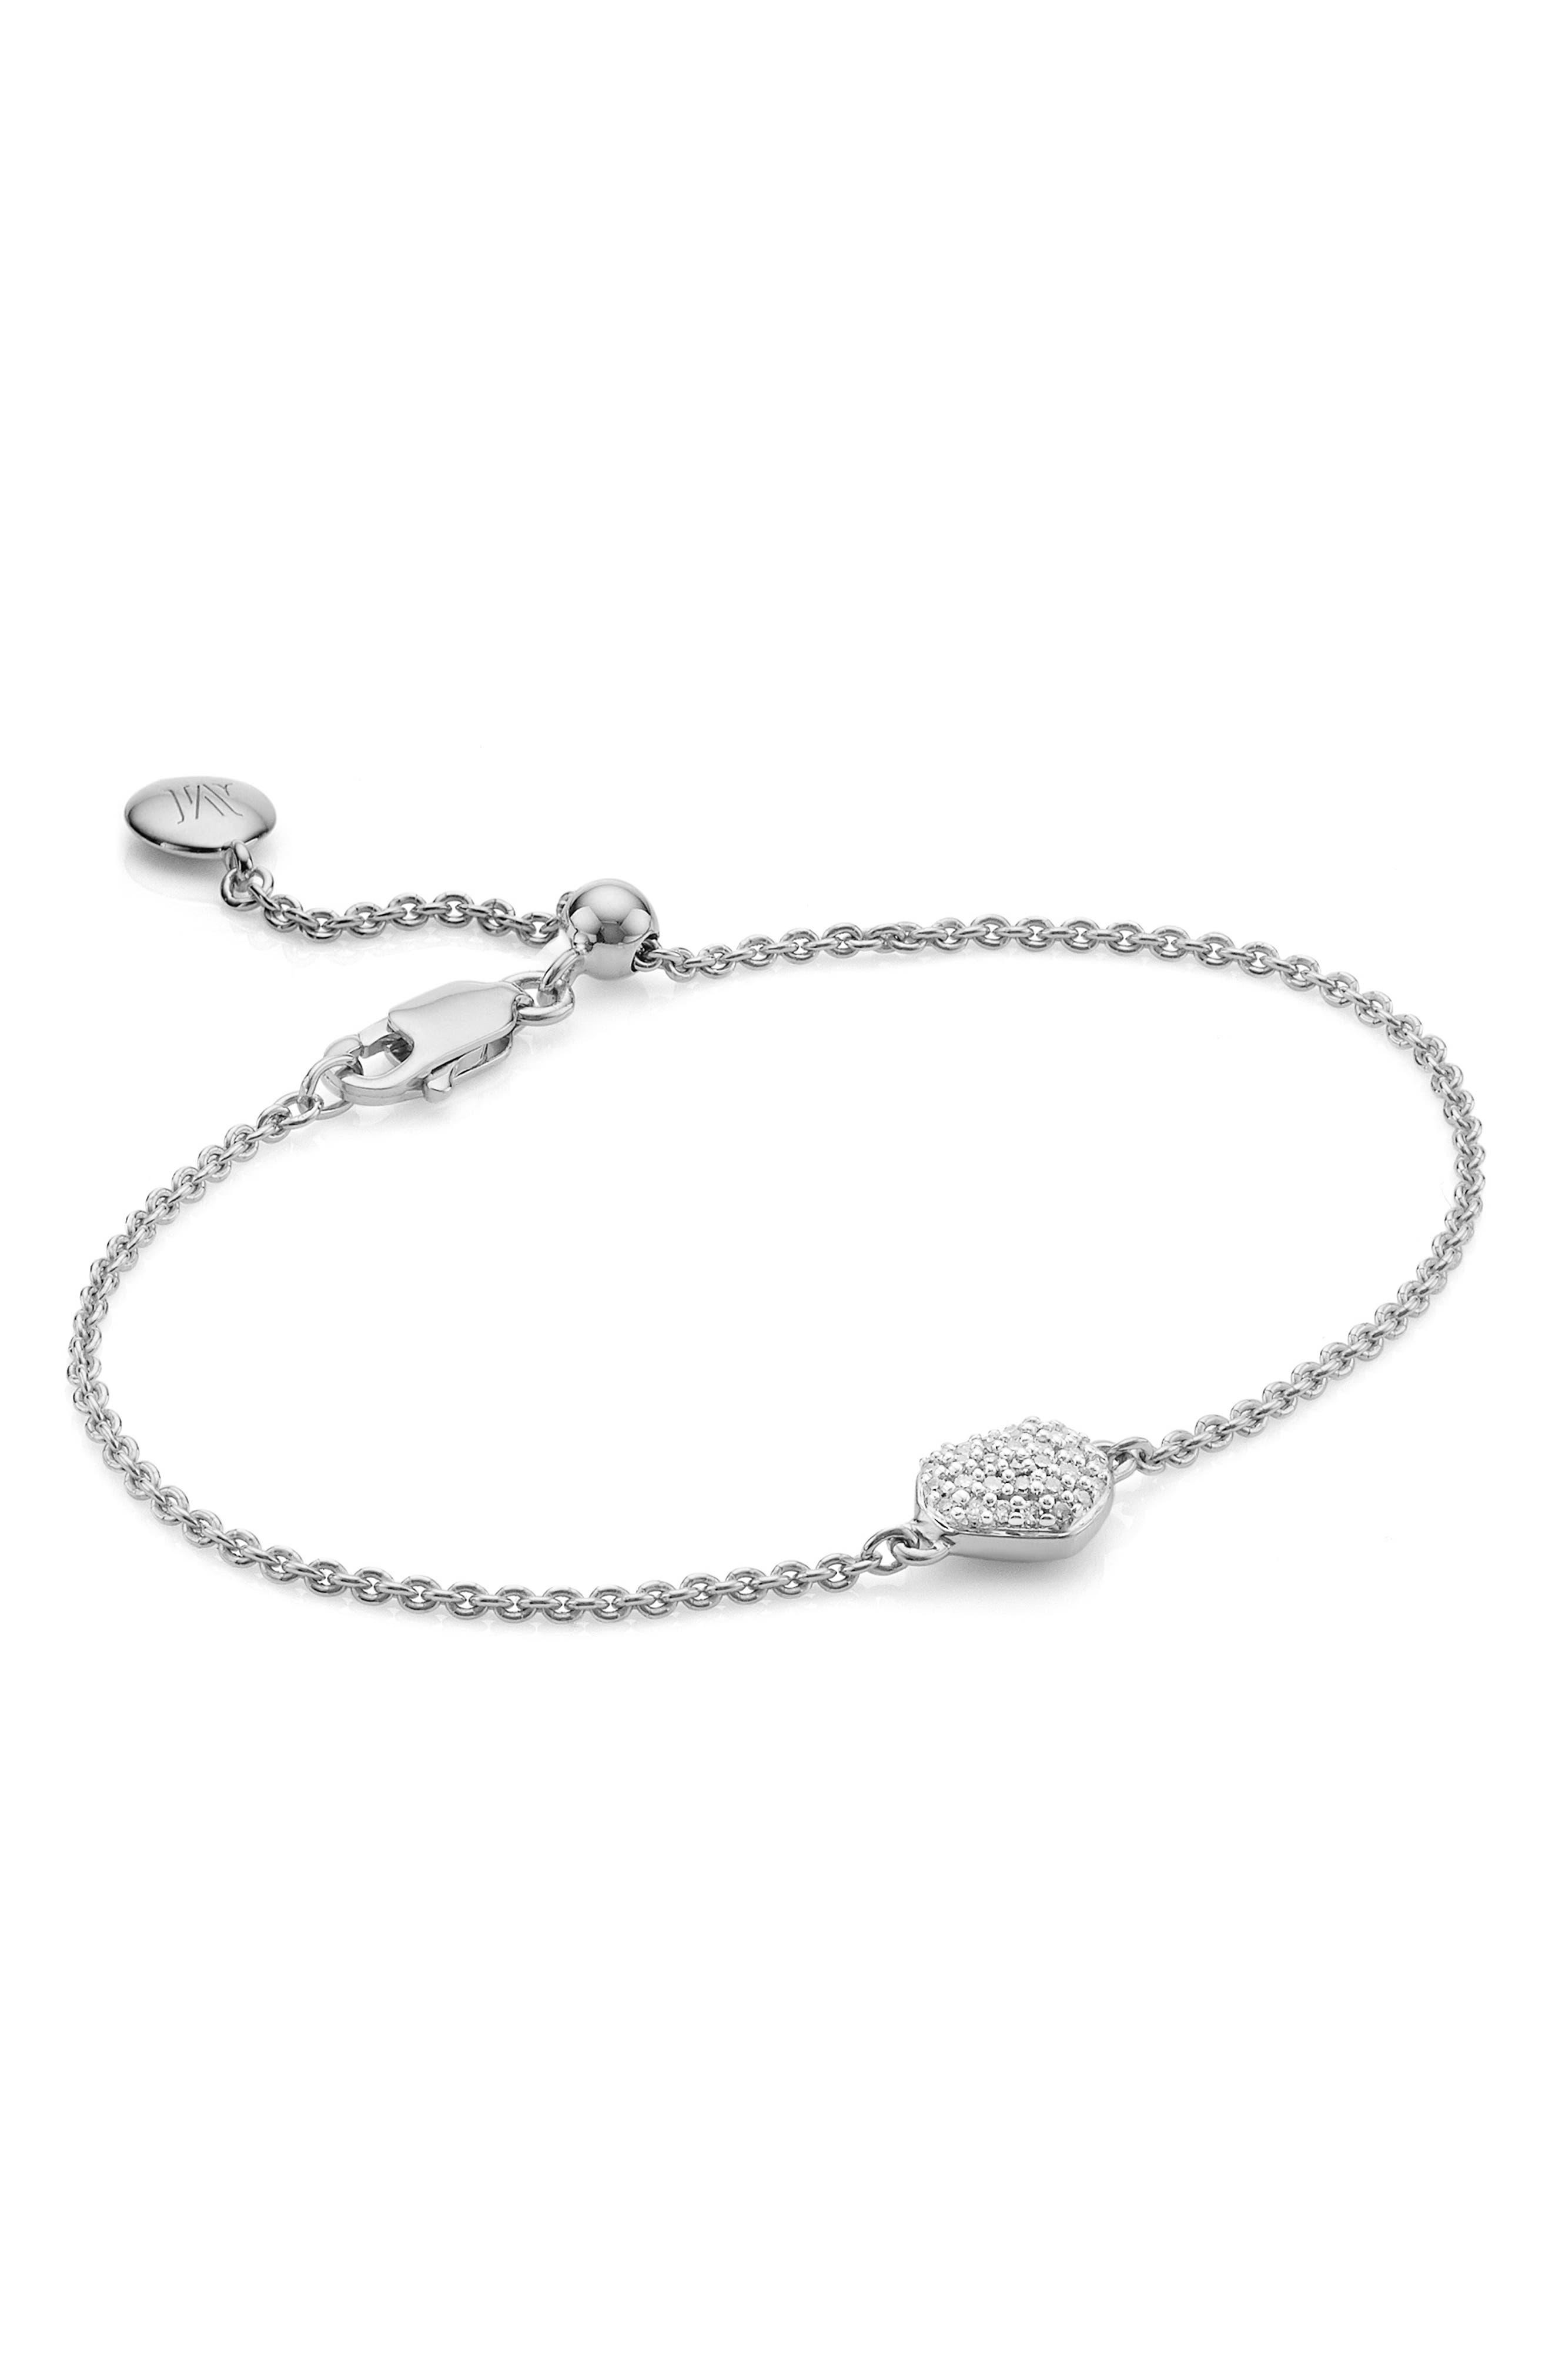 MONICA VINADER Nura Mini Diamond Heart Bracelet, Main, color, SILVER/ DIAMOND